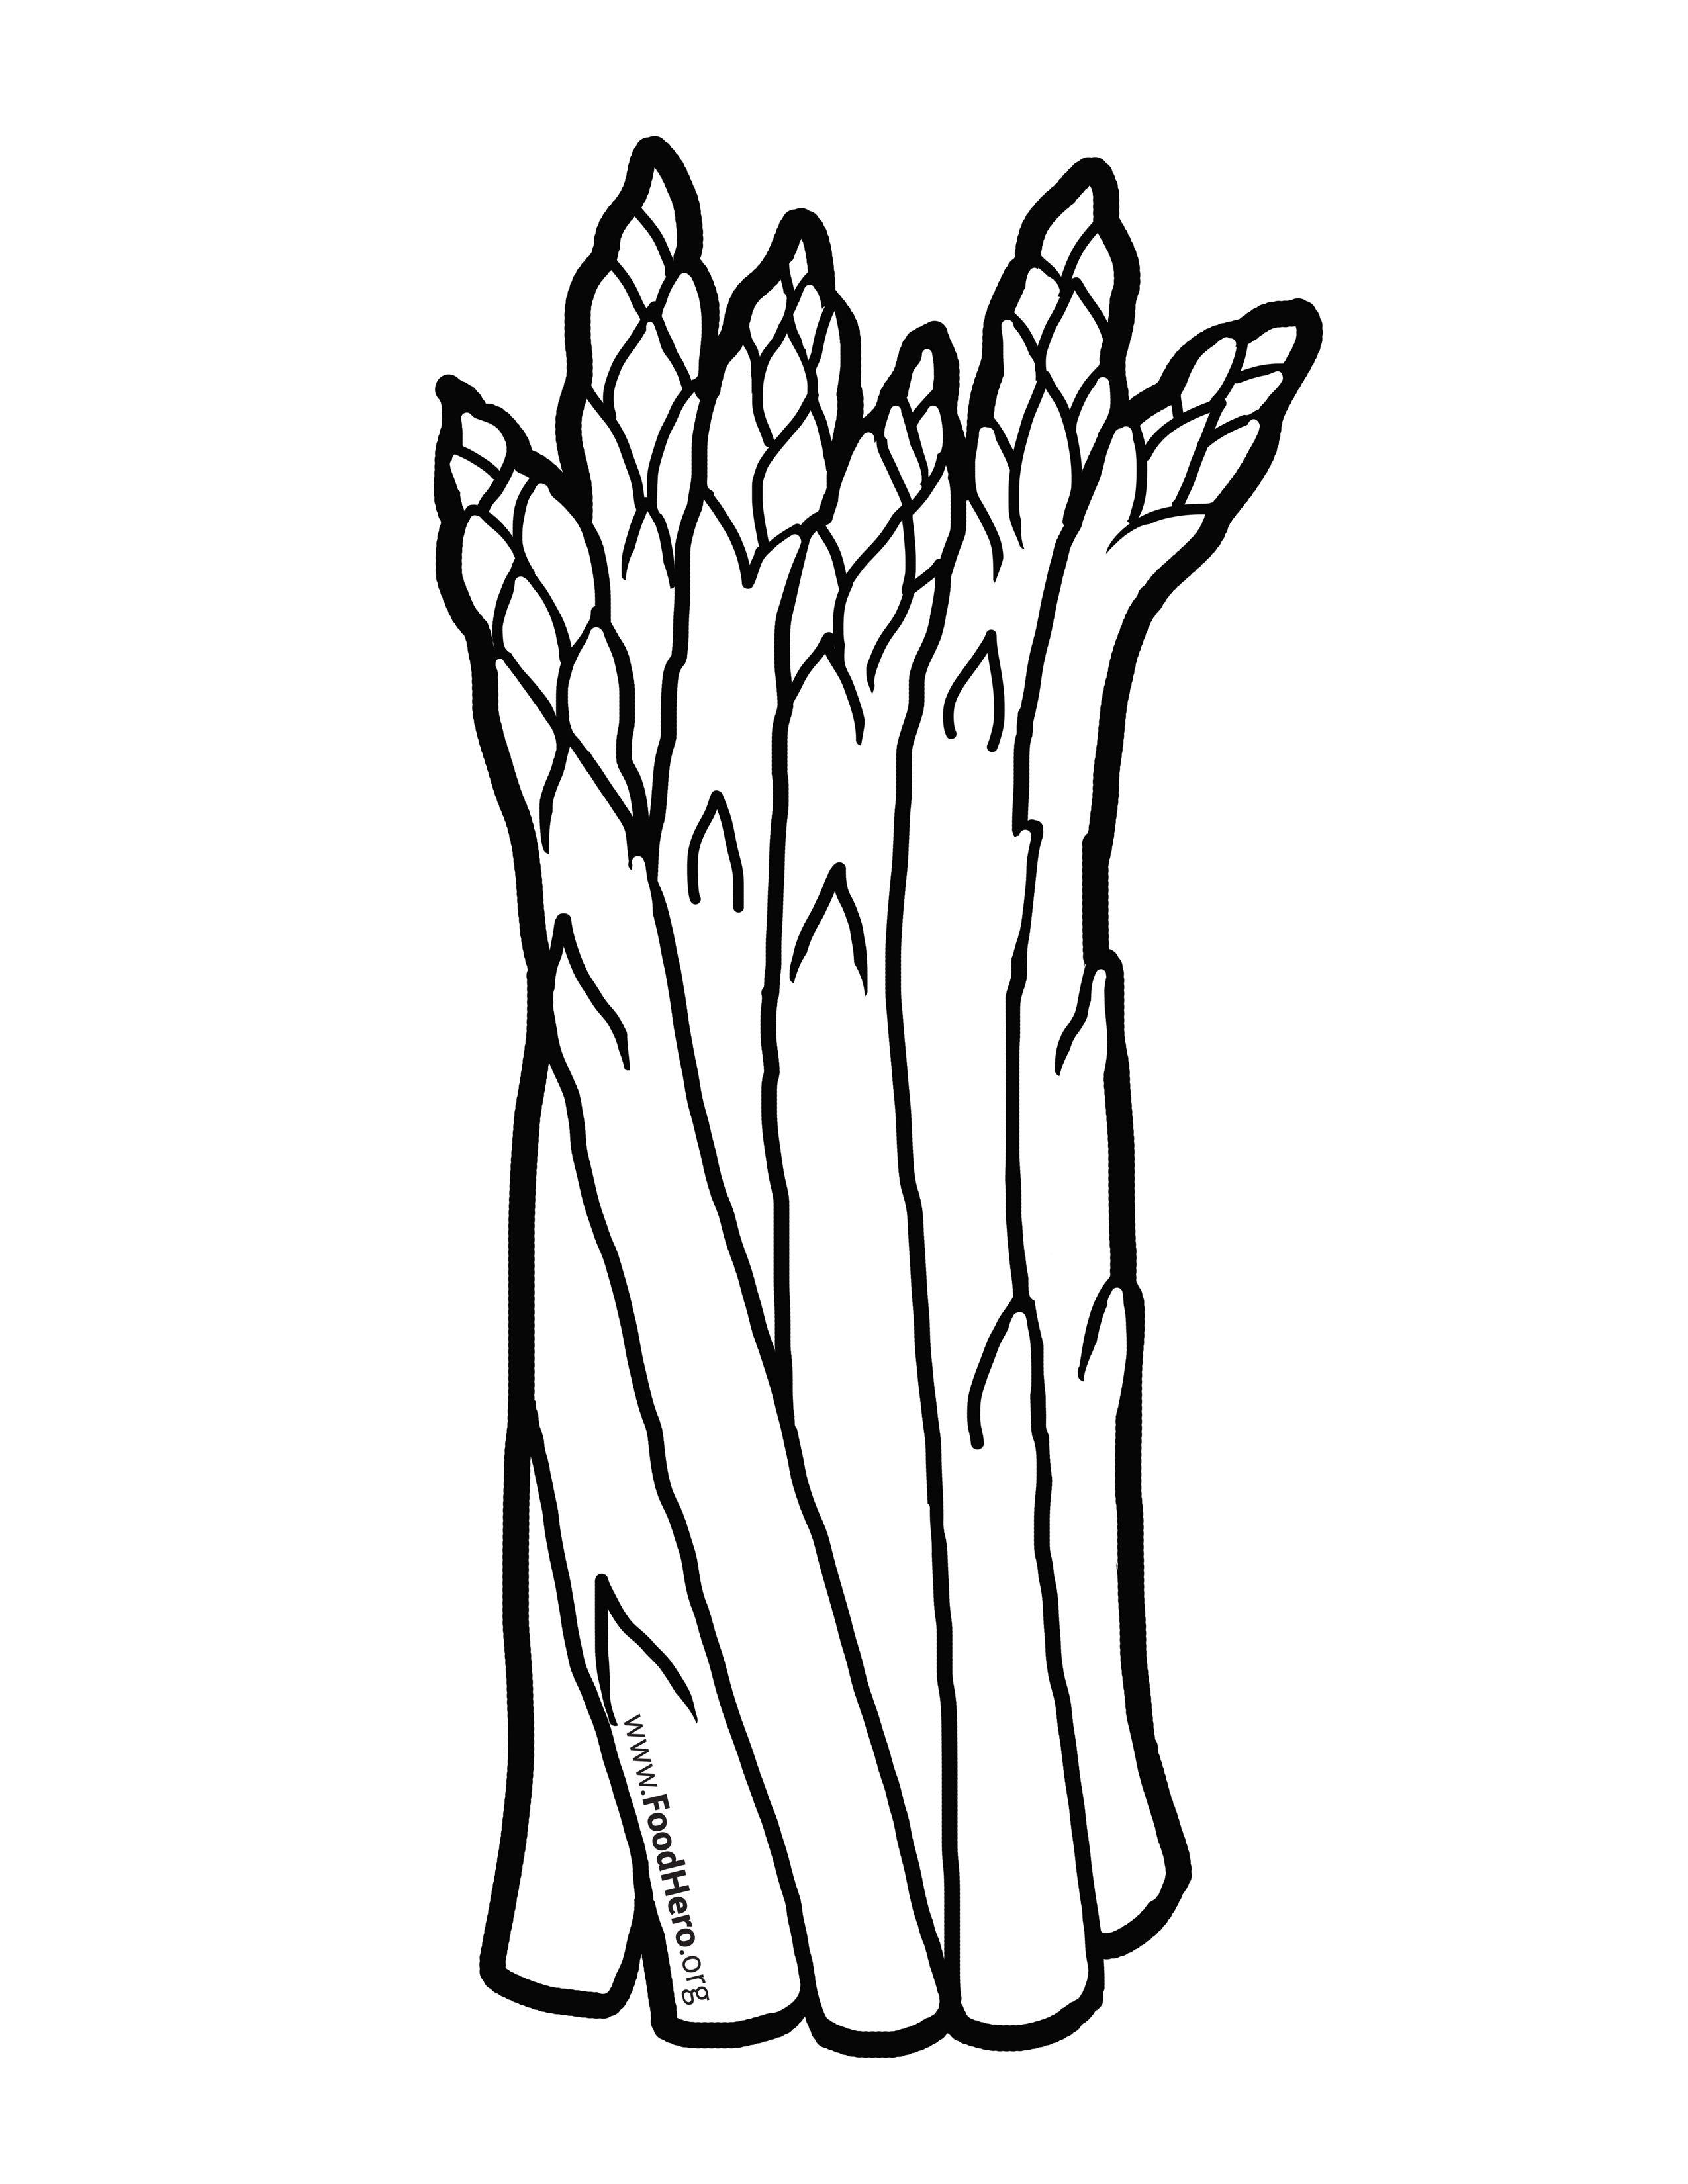 Asparagus Illustration Foodhero Bullentinboards Artwork